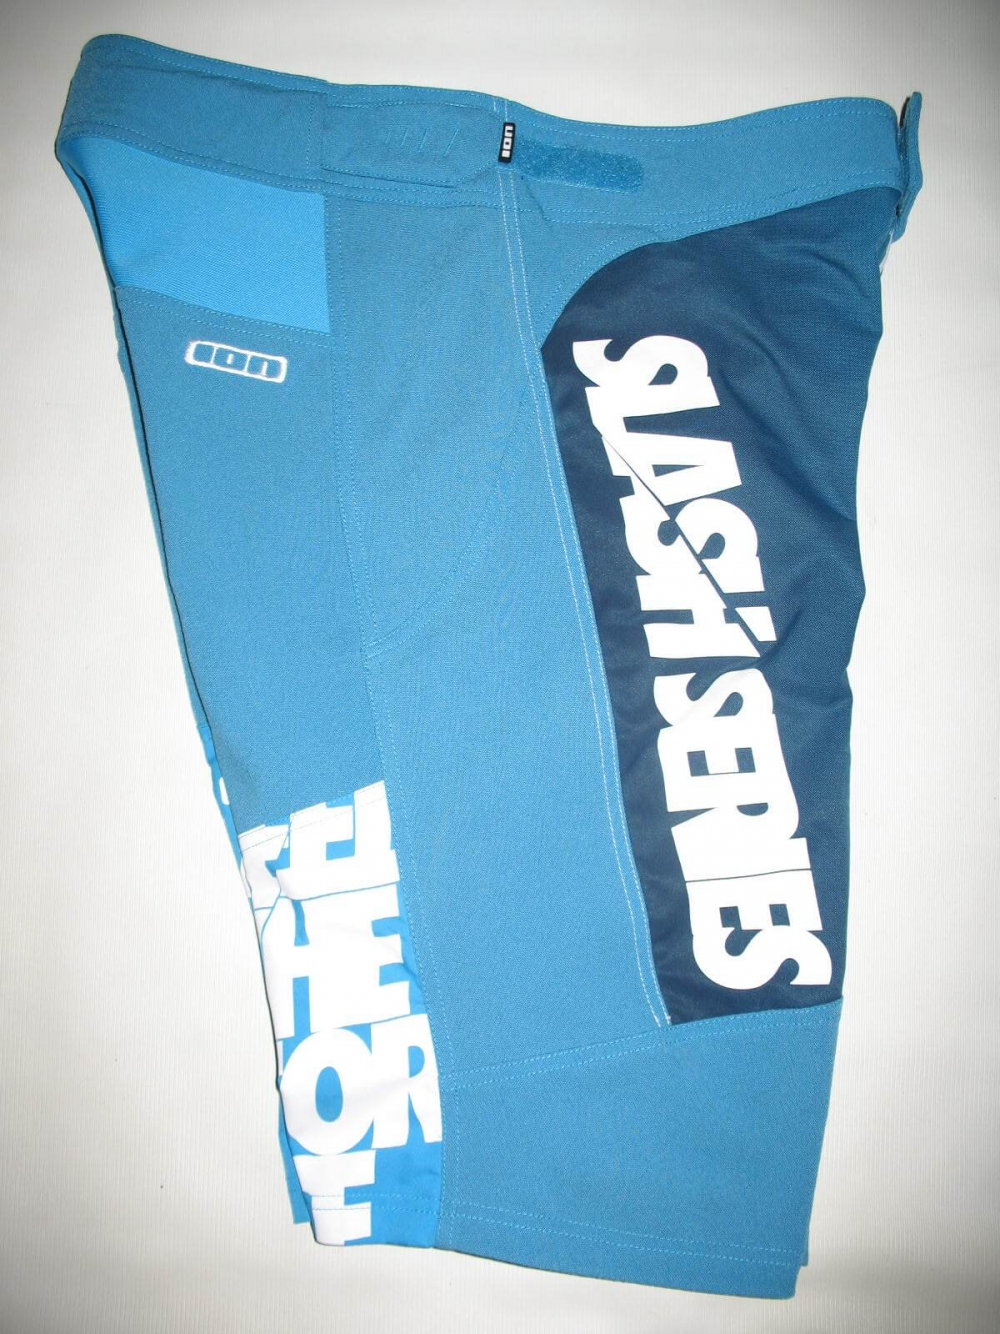 Шорты ION slash series DH shorts (размер 36/XL) - 2